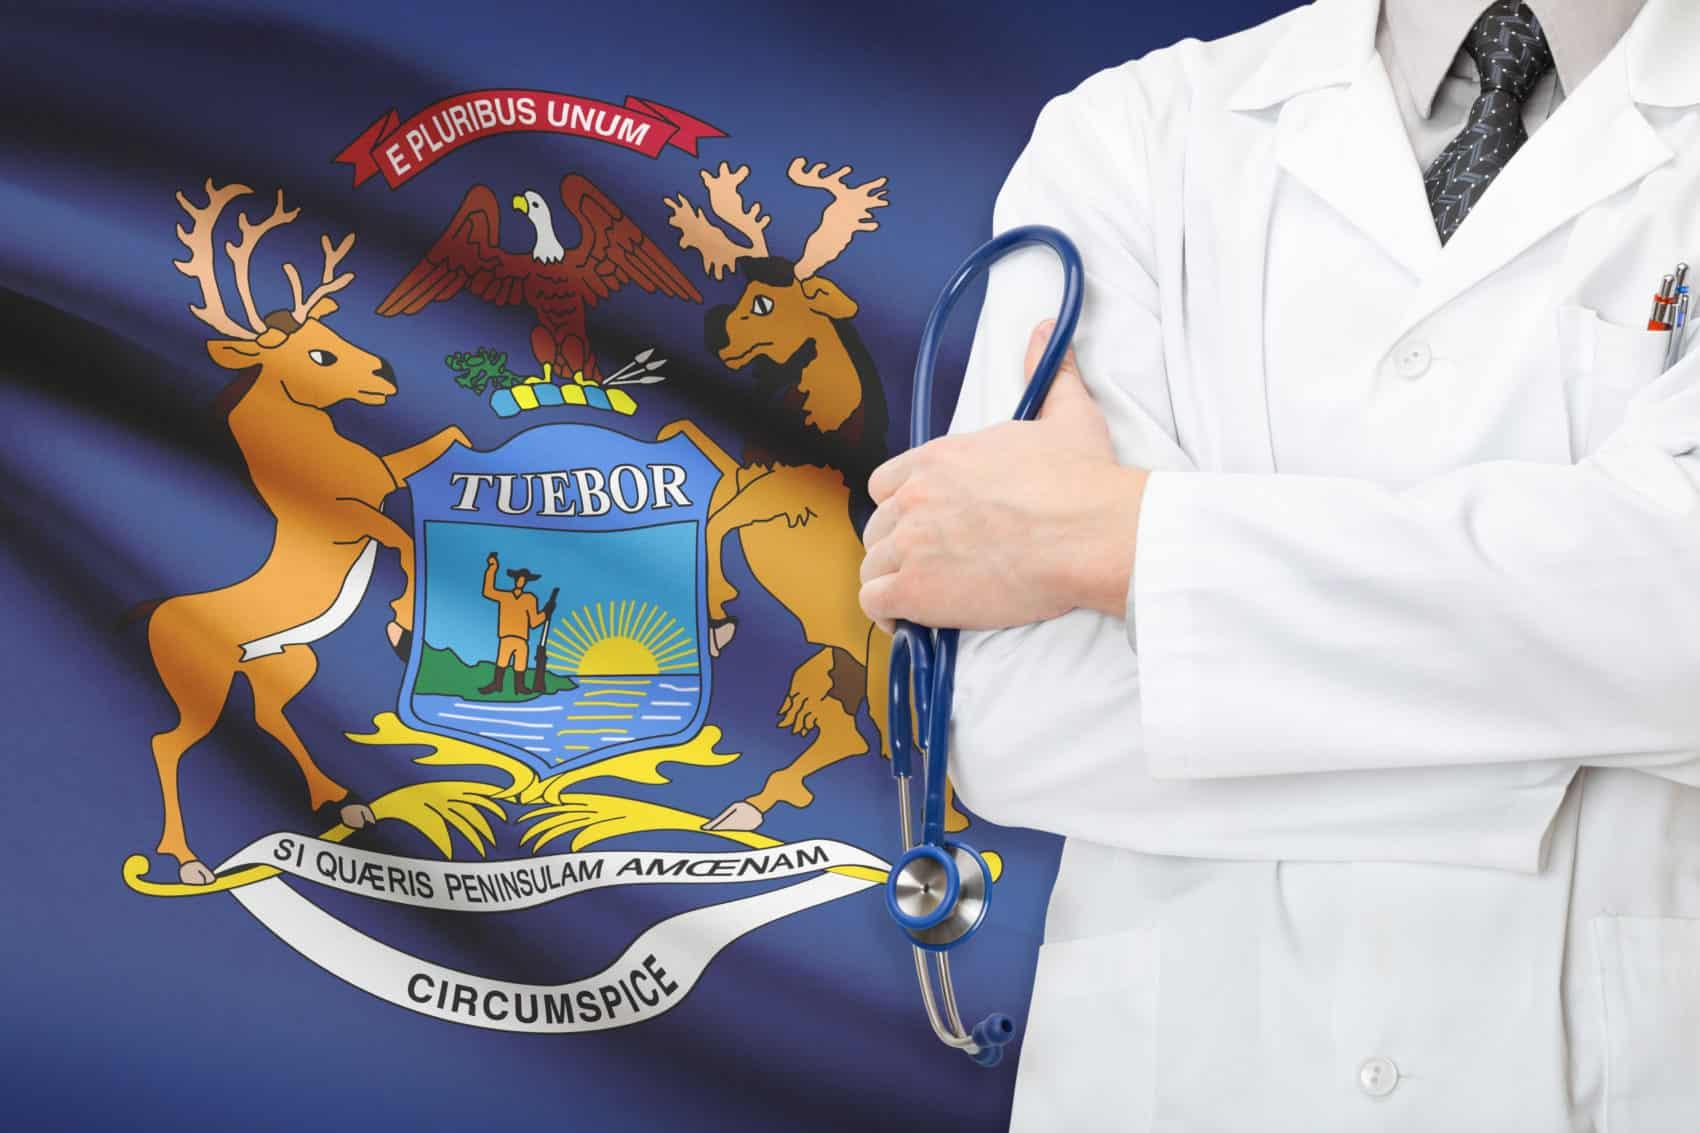 How to Get a Medical Marijuana Card in Michigan - 5 Easy Steps - Quantum 9, Inc.